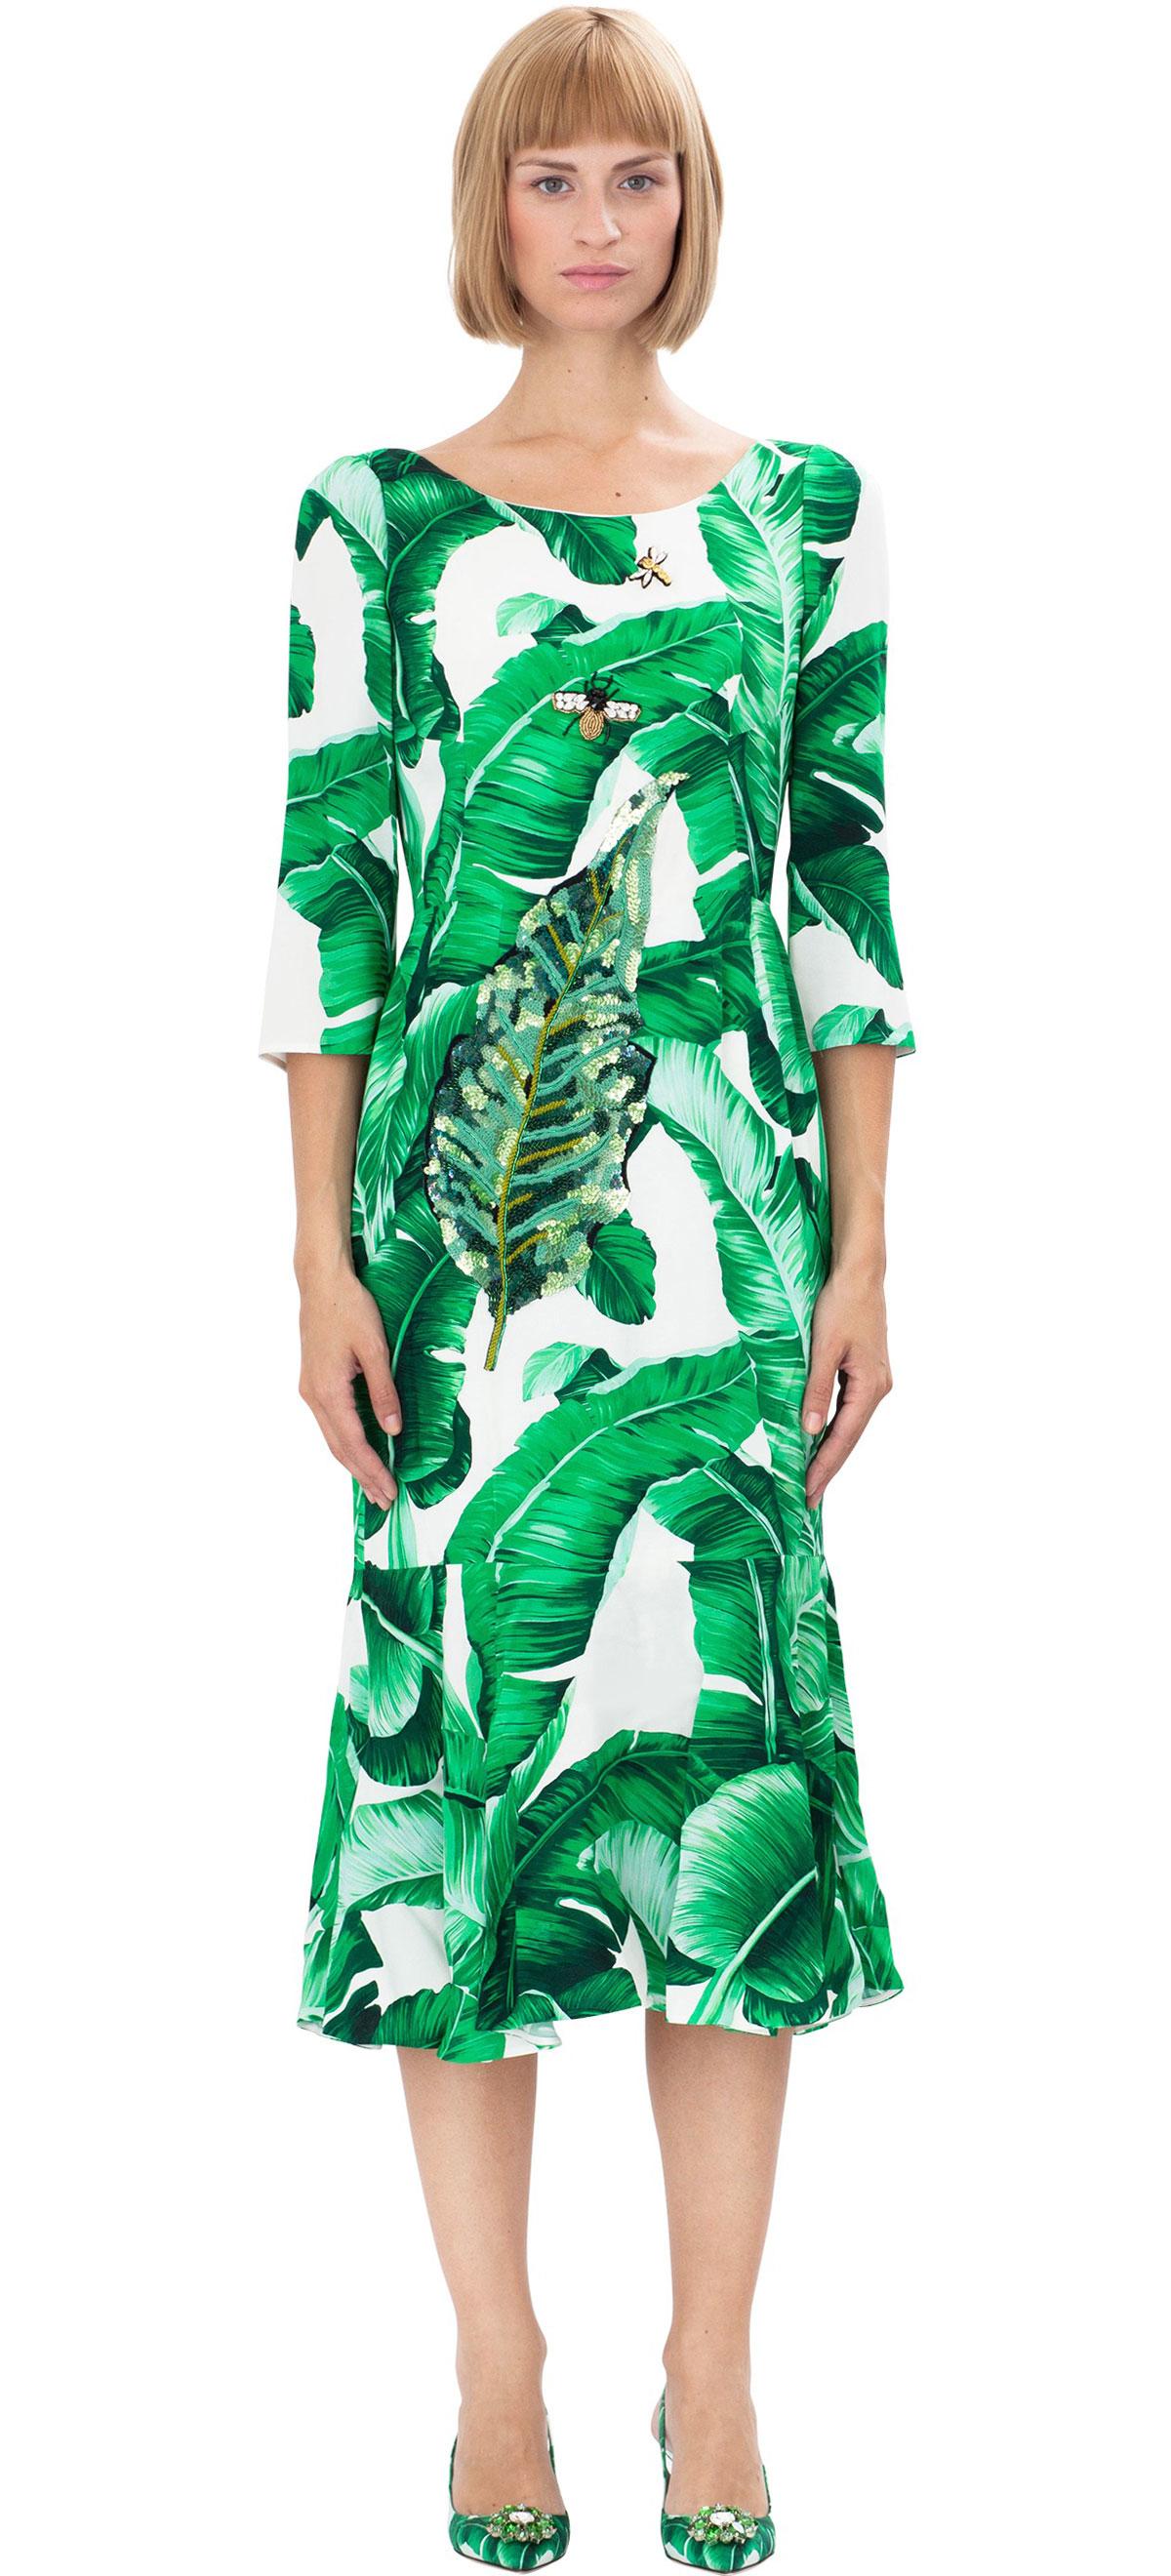 Banana Print Leaf Clothing